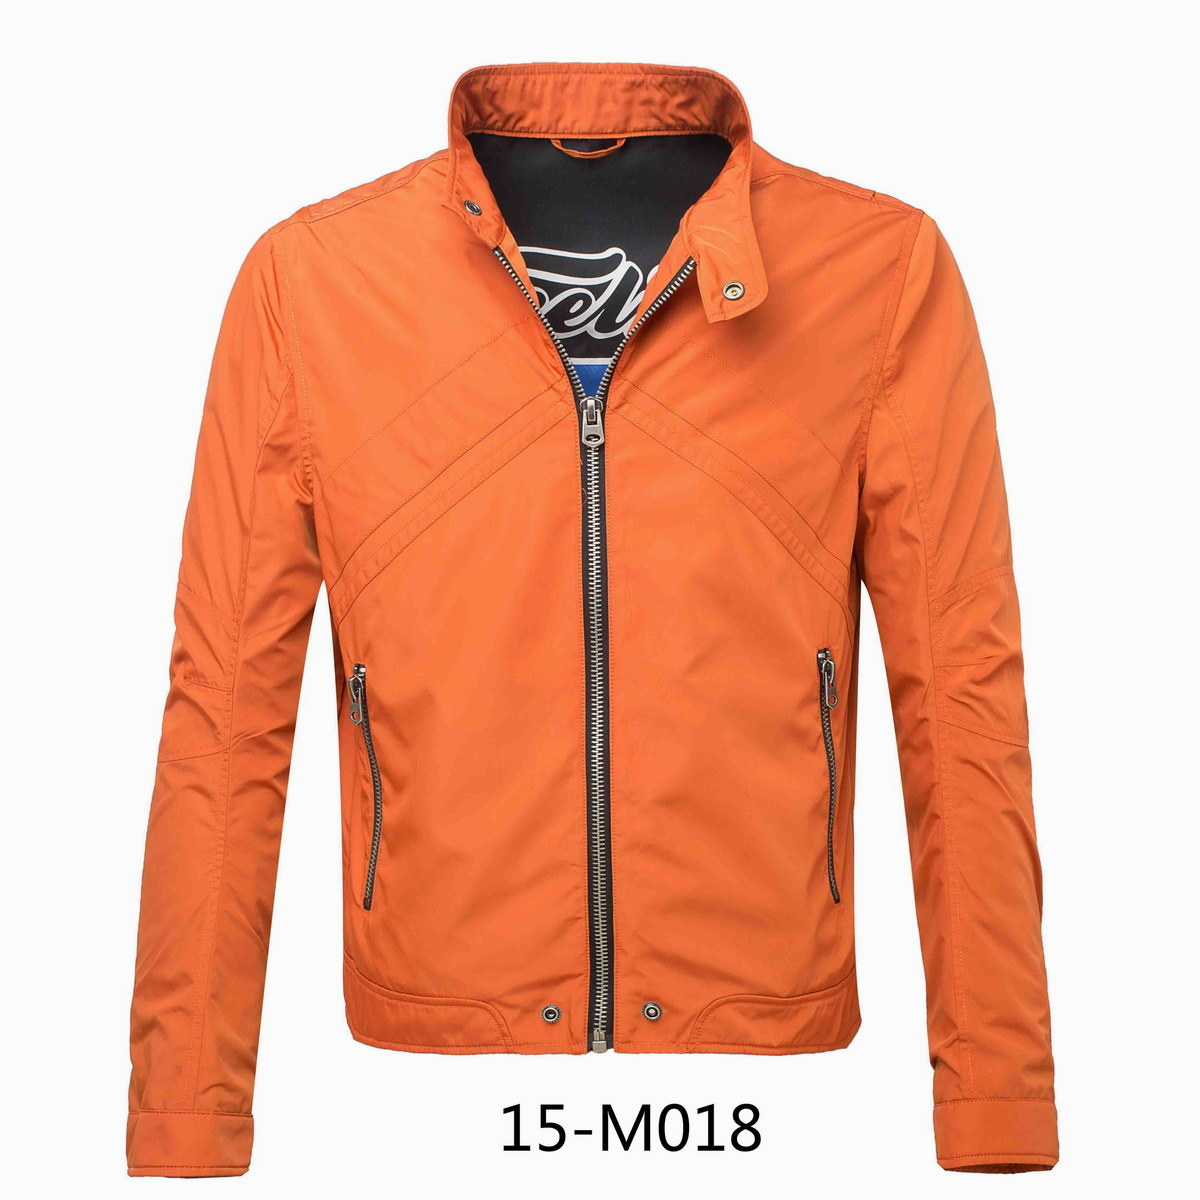 Men Casual Autumn/Spring Jacket (15-M018)